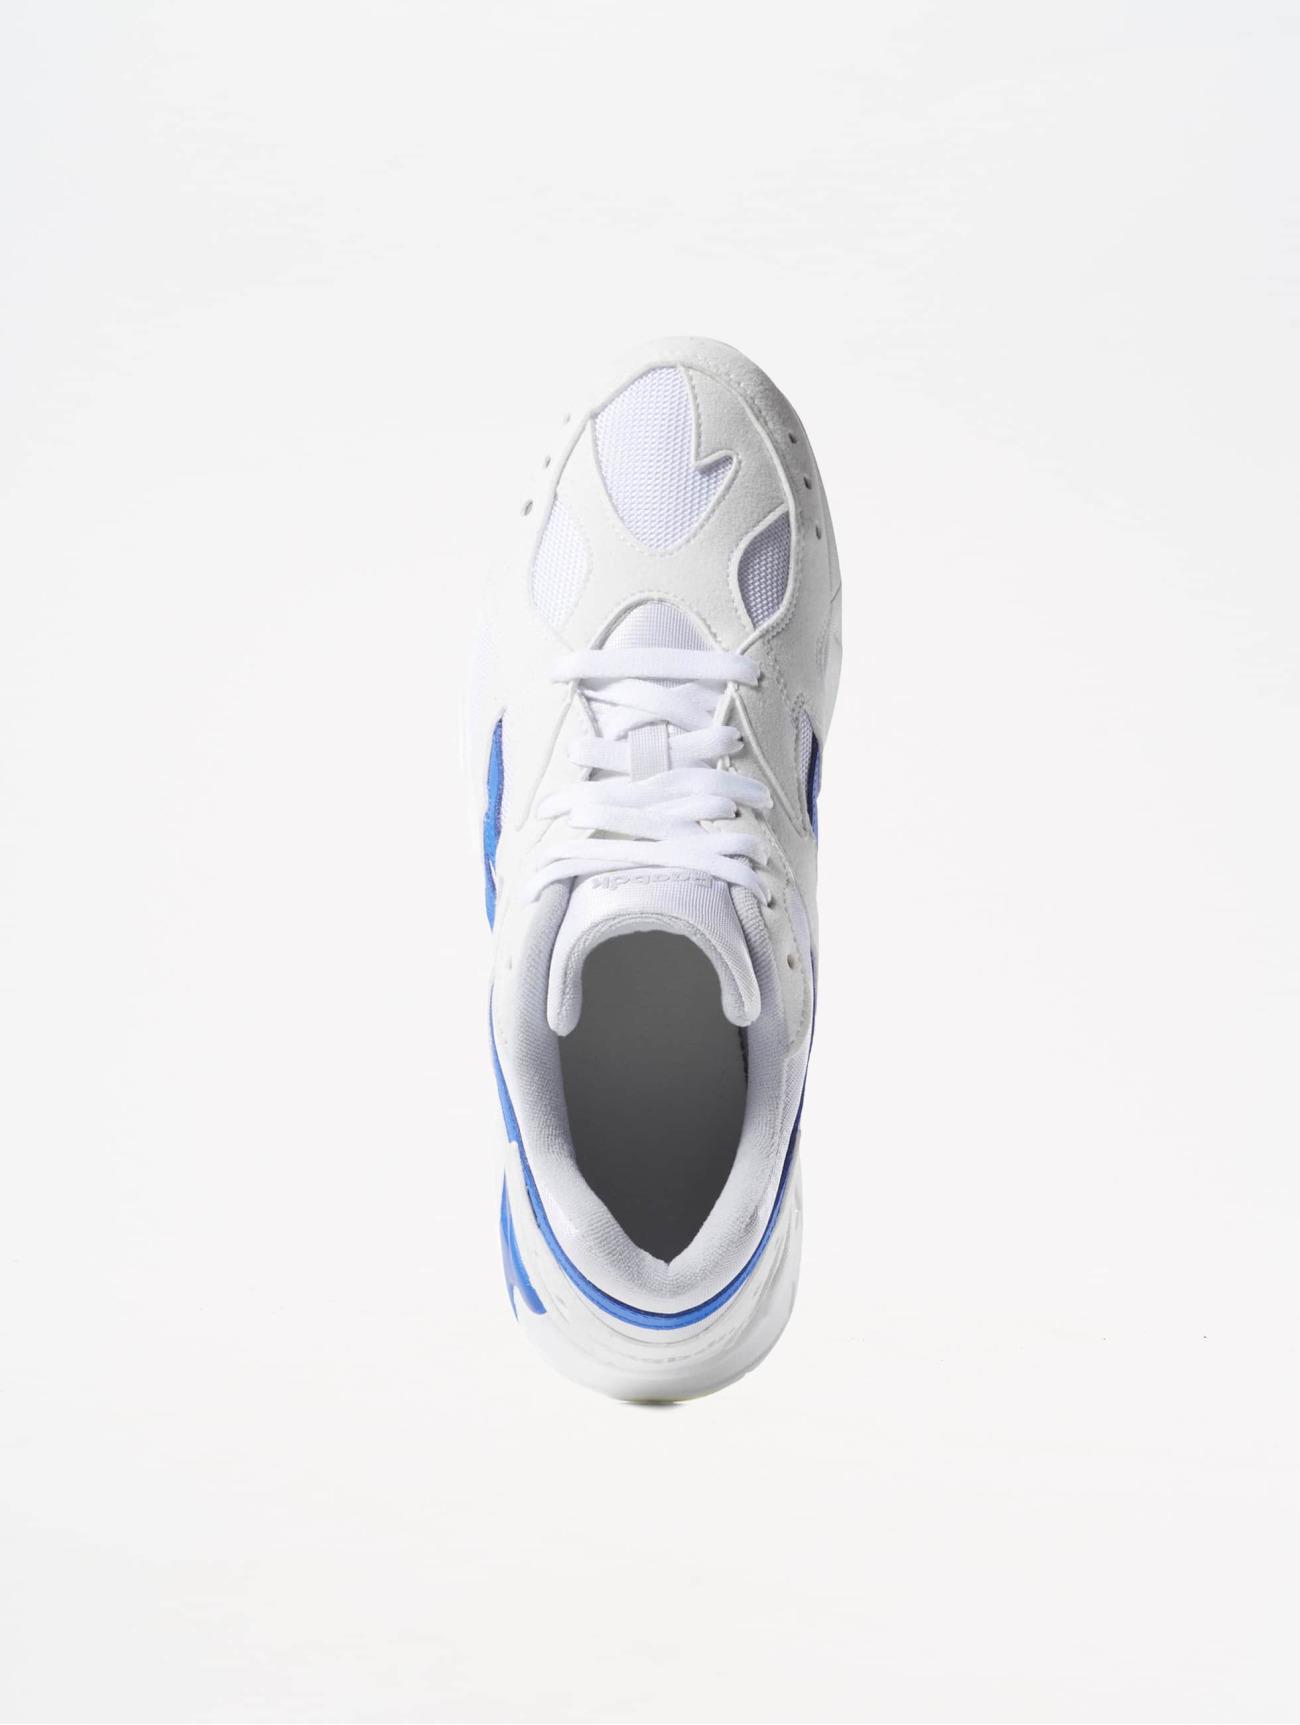 Reebok Aztrek blanc Baskets 598449 Homme Chaussures